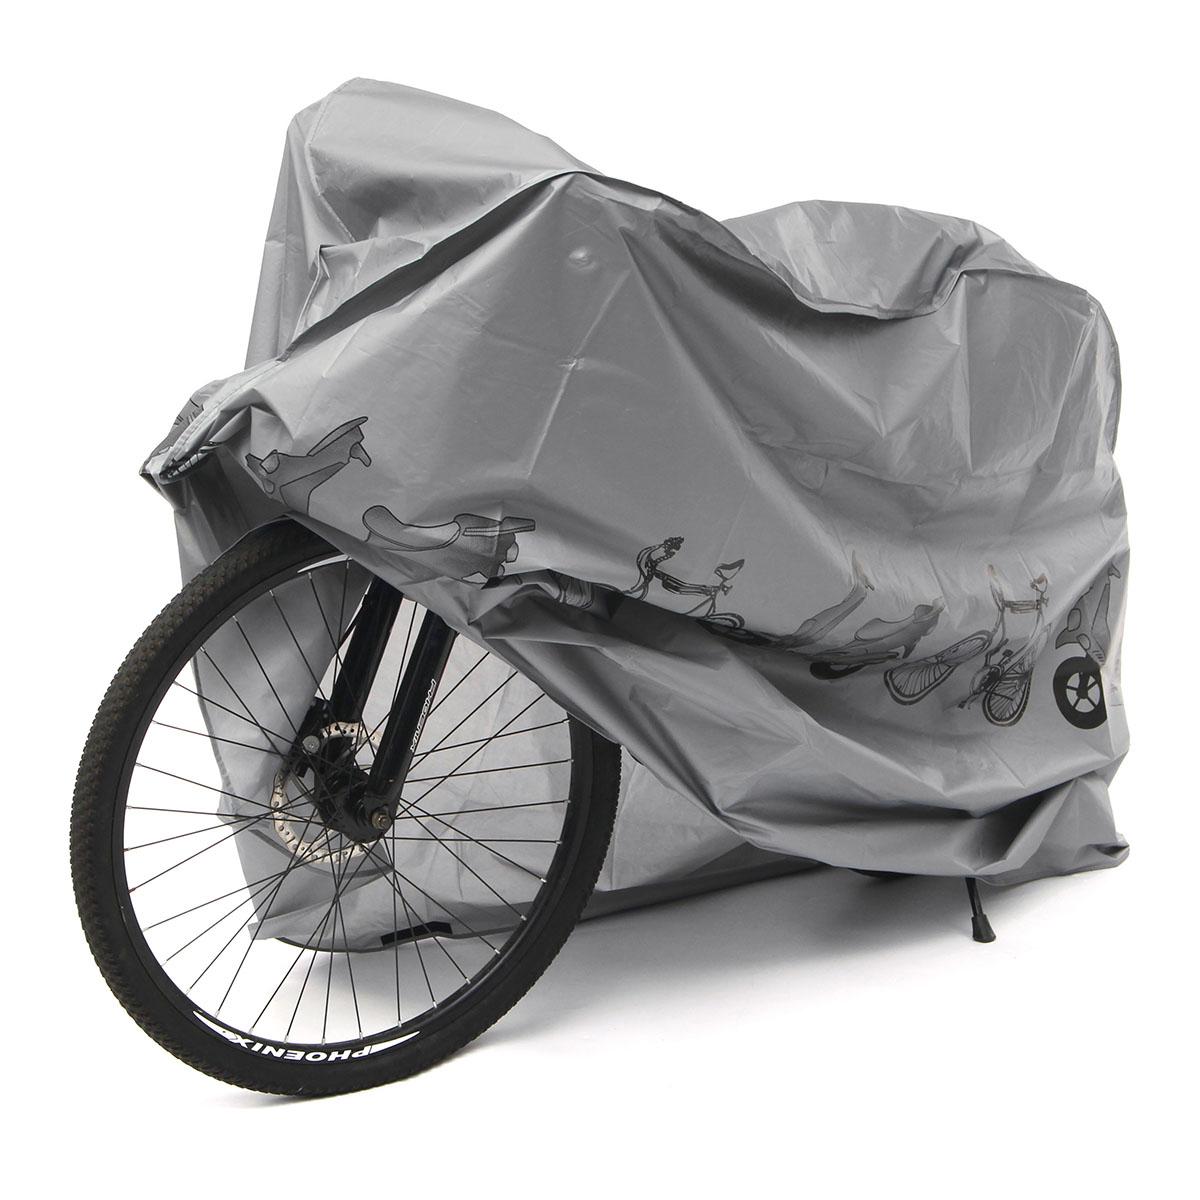 Велосипед Велосипед мотоцикл Чехол Водонепроницаемы Анти UV Погода пыленепроницаемая - фото 6